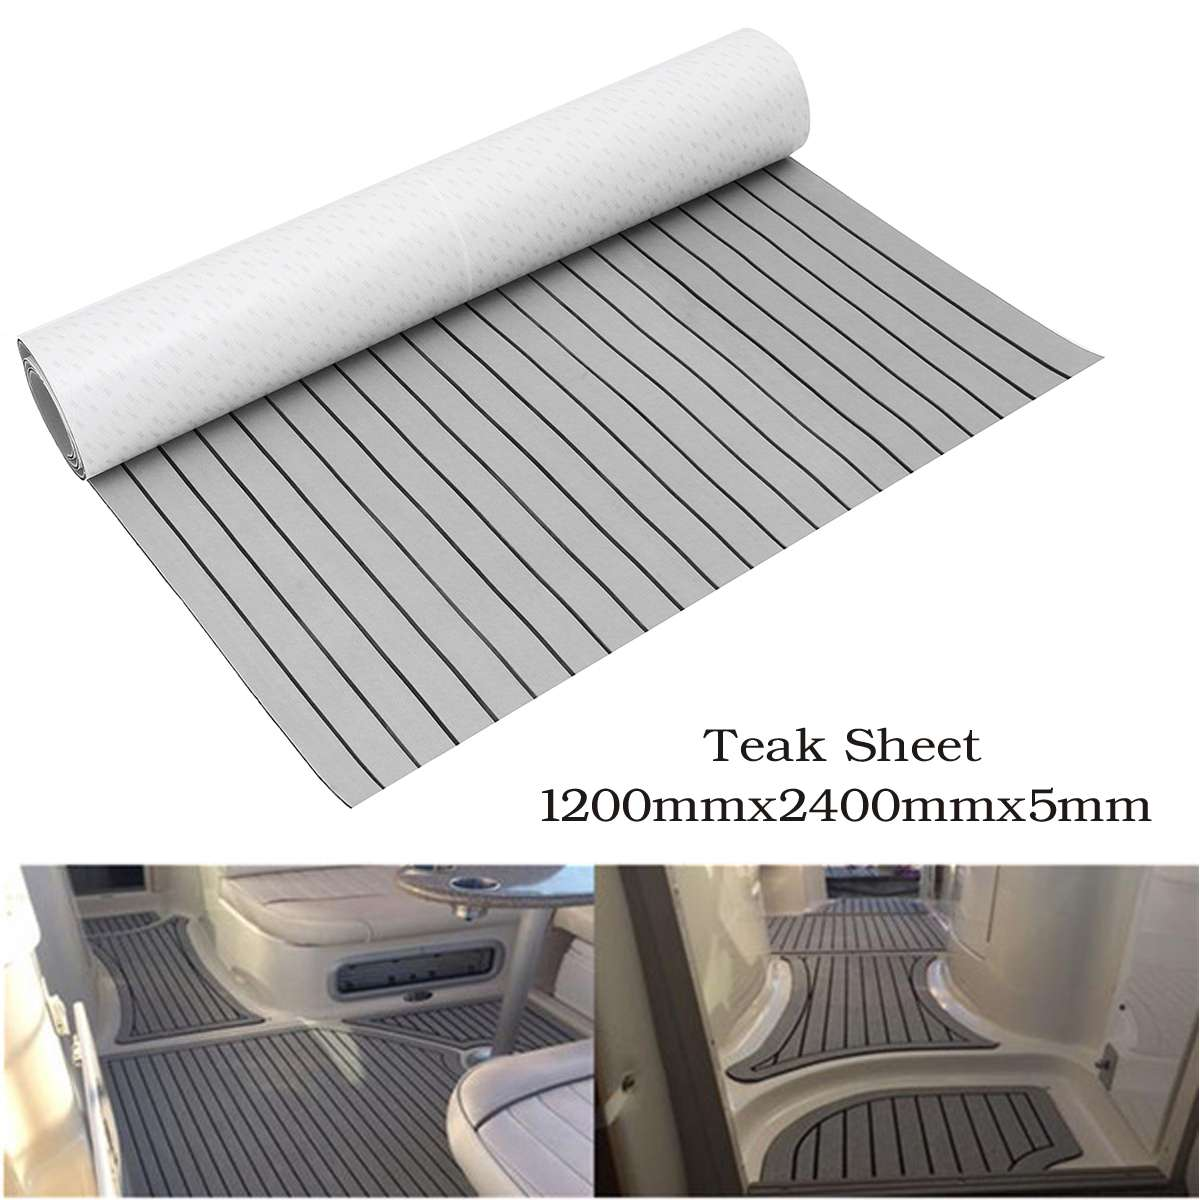 1200mmx2400mm Self Adhesive EVA Foam Teak Sheet Teak Boat Decking Car Boat Yacht Synthetic Teak Flooring Floor Mat Pad Grey 5mm